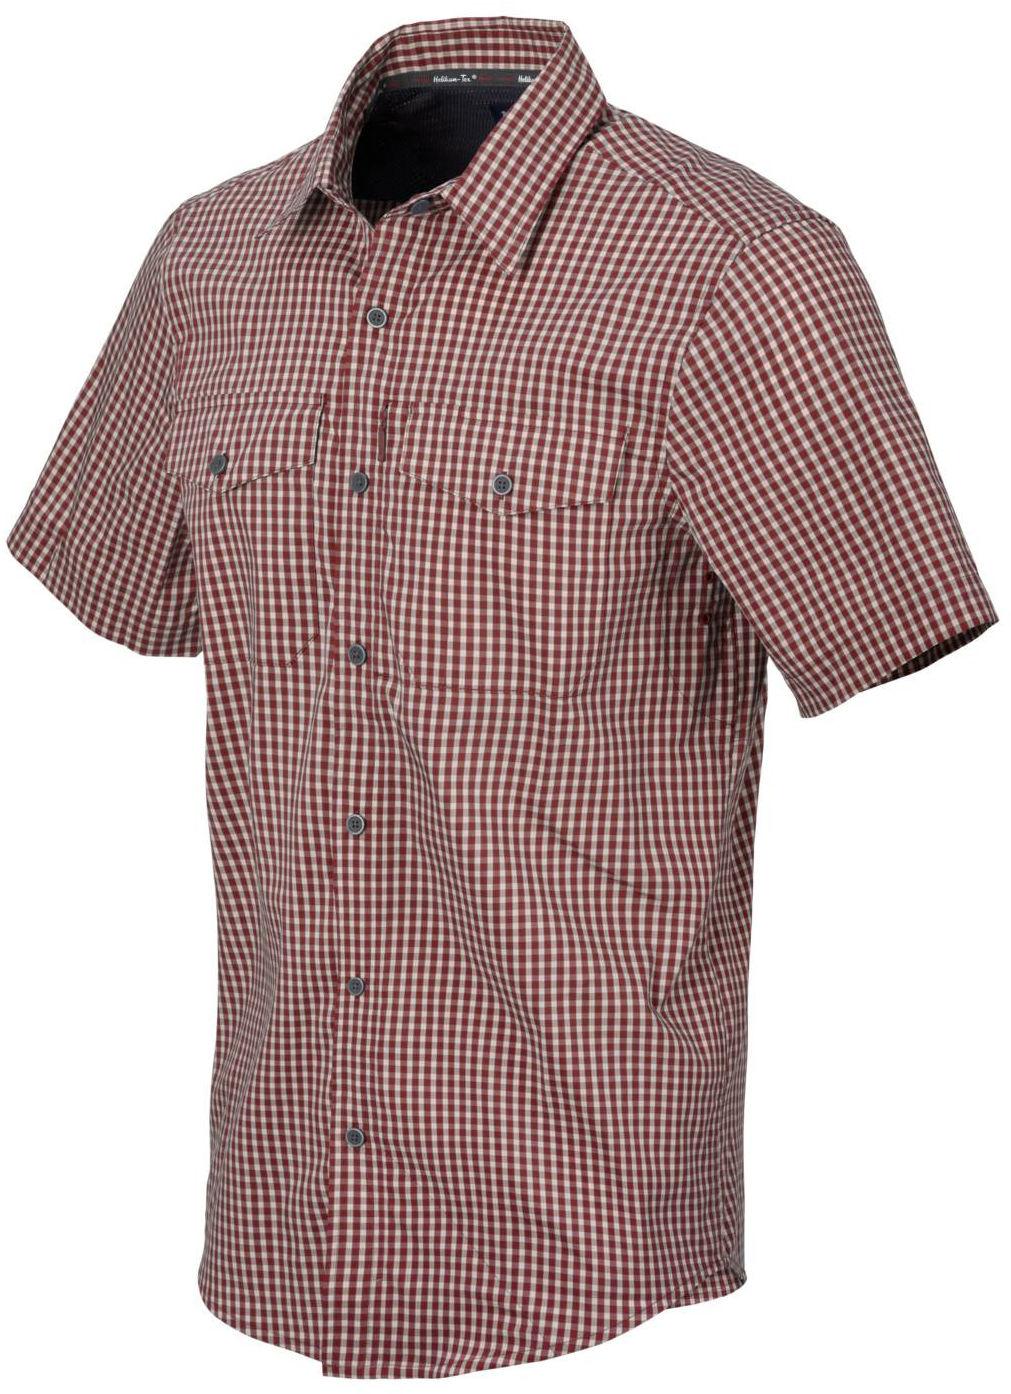 Koszula Helikon Covert Concealed Carry Short Sleeve Dirt Red Checkered (KO-CCS-CB-C5) H